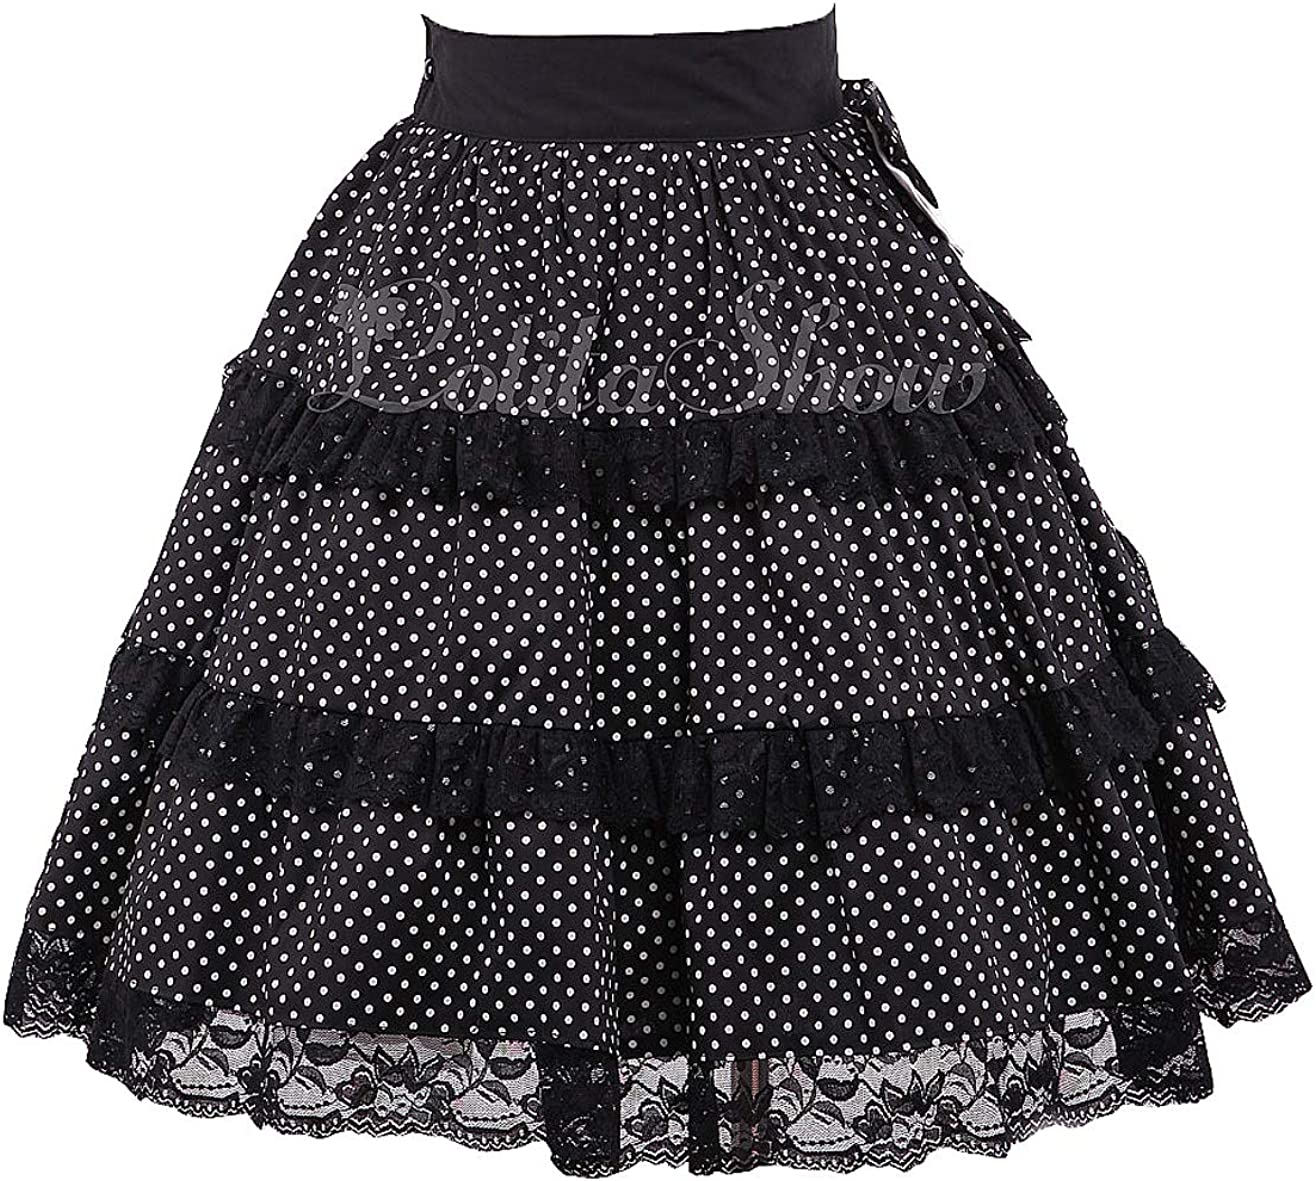 Antaina Black Lace Bow Floral Layered Sweet Chiffon Cotton Lolita Bottom Skirt